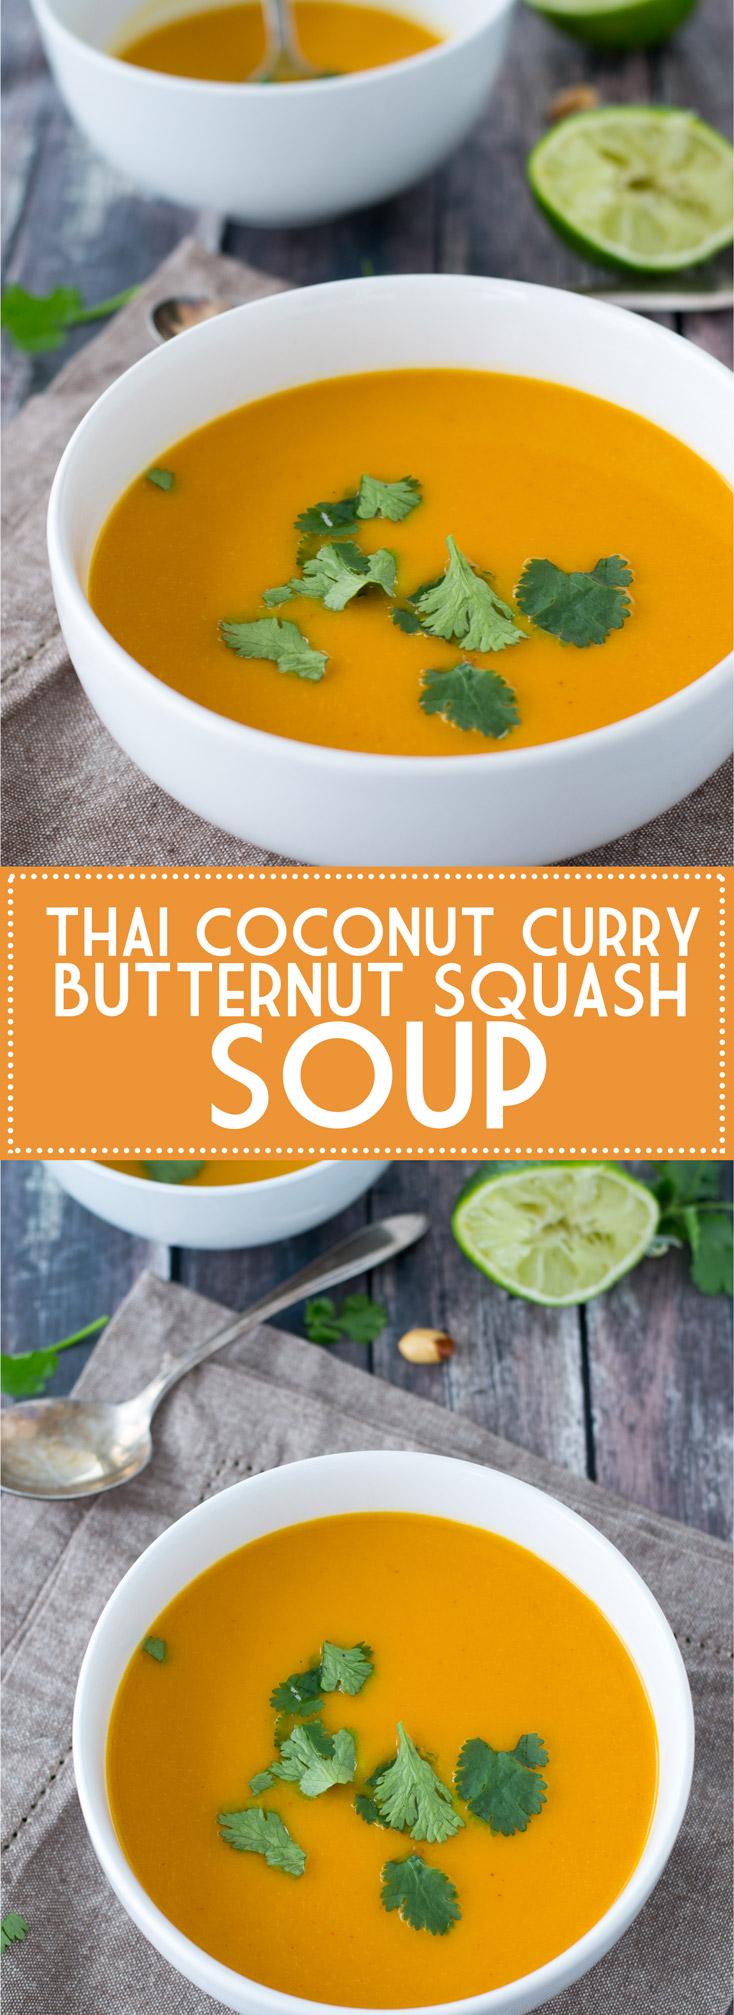 Thai Coconut Curry Butternut Squash Soup | www.motherthyme.com